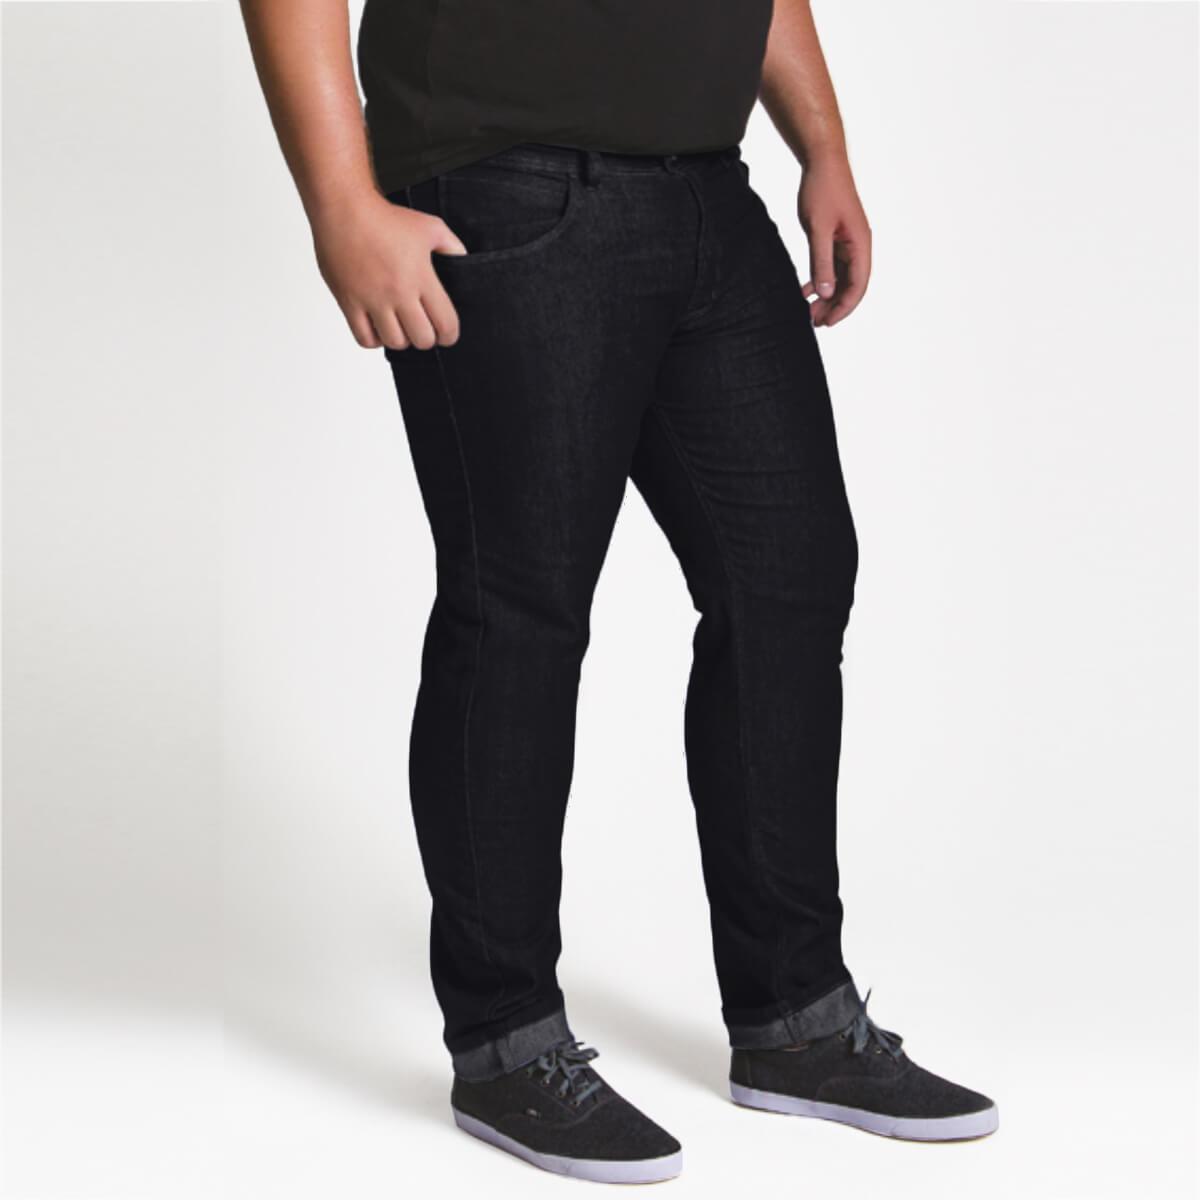 Calça Jeans Masculina Premium Plus Size Elastano Petrol